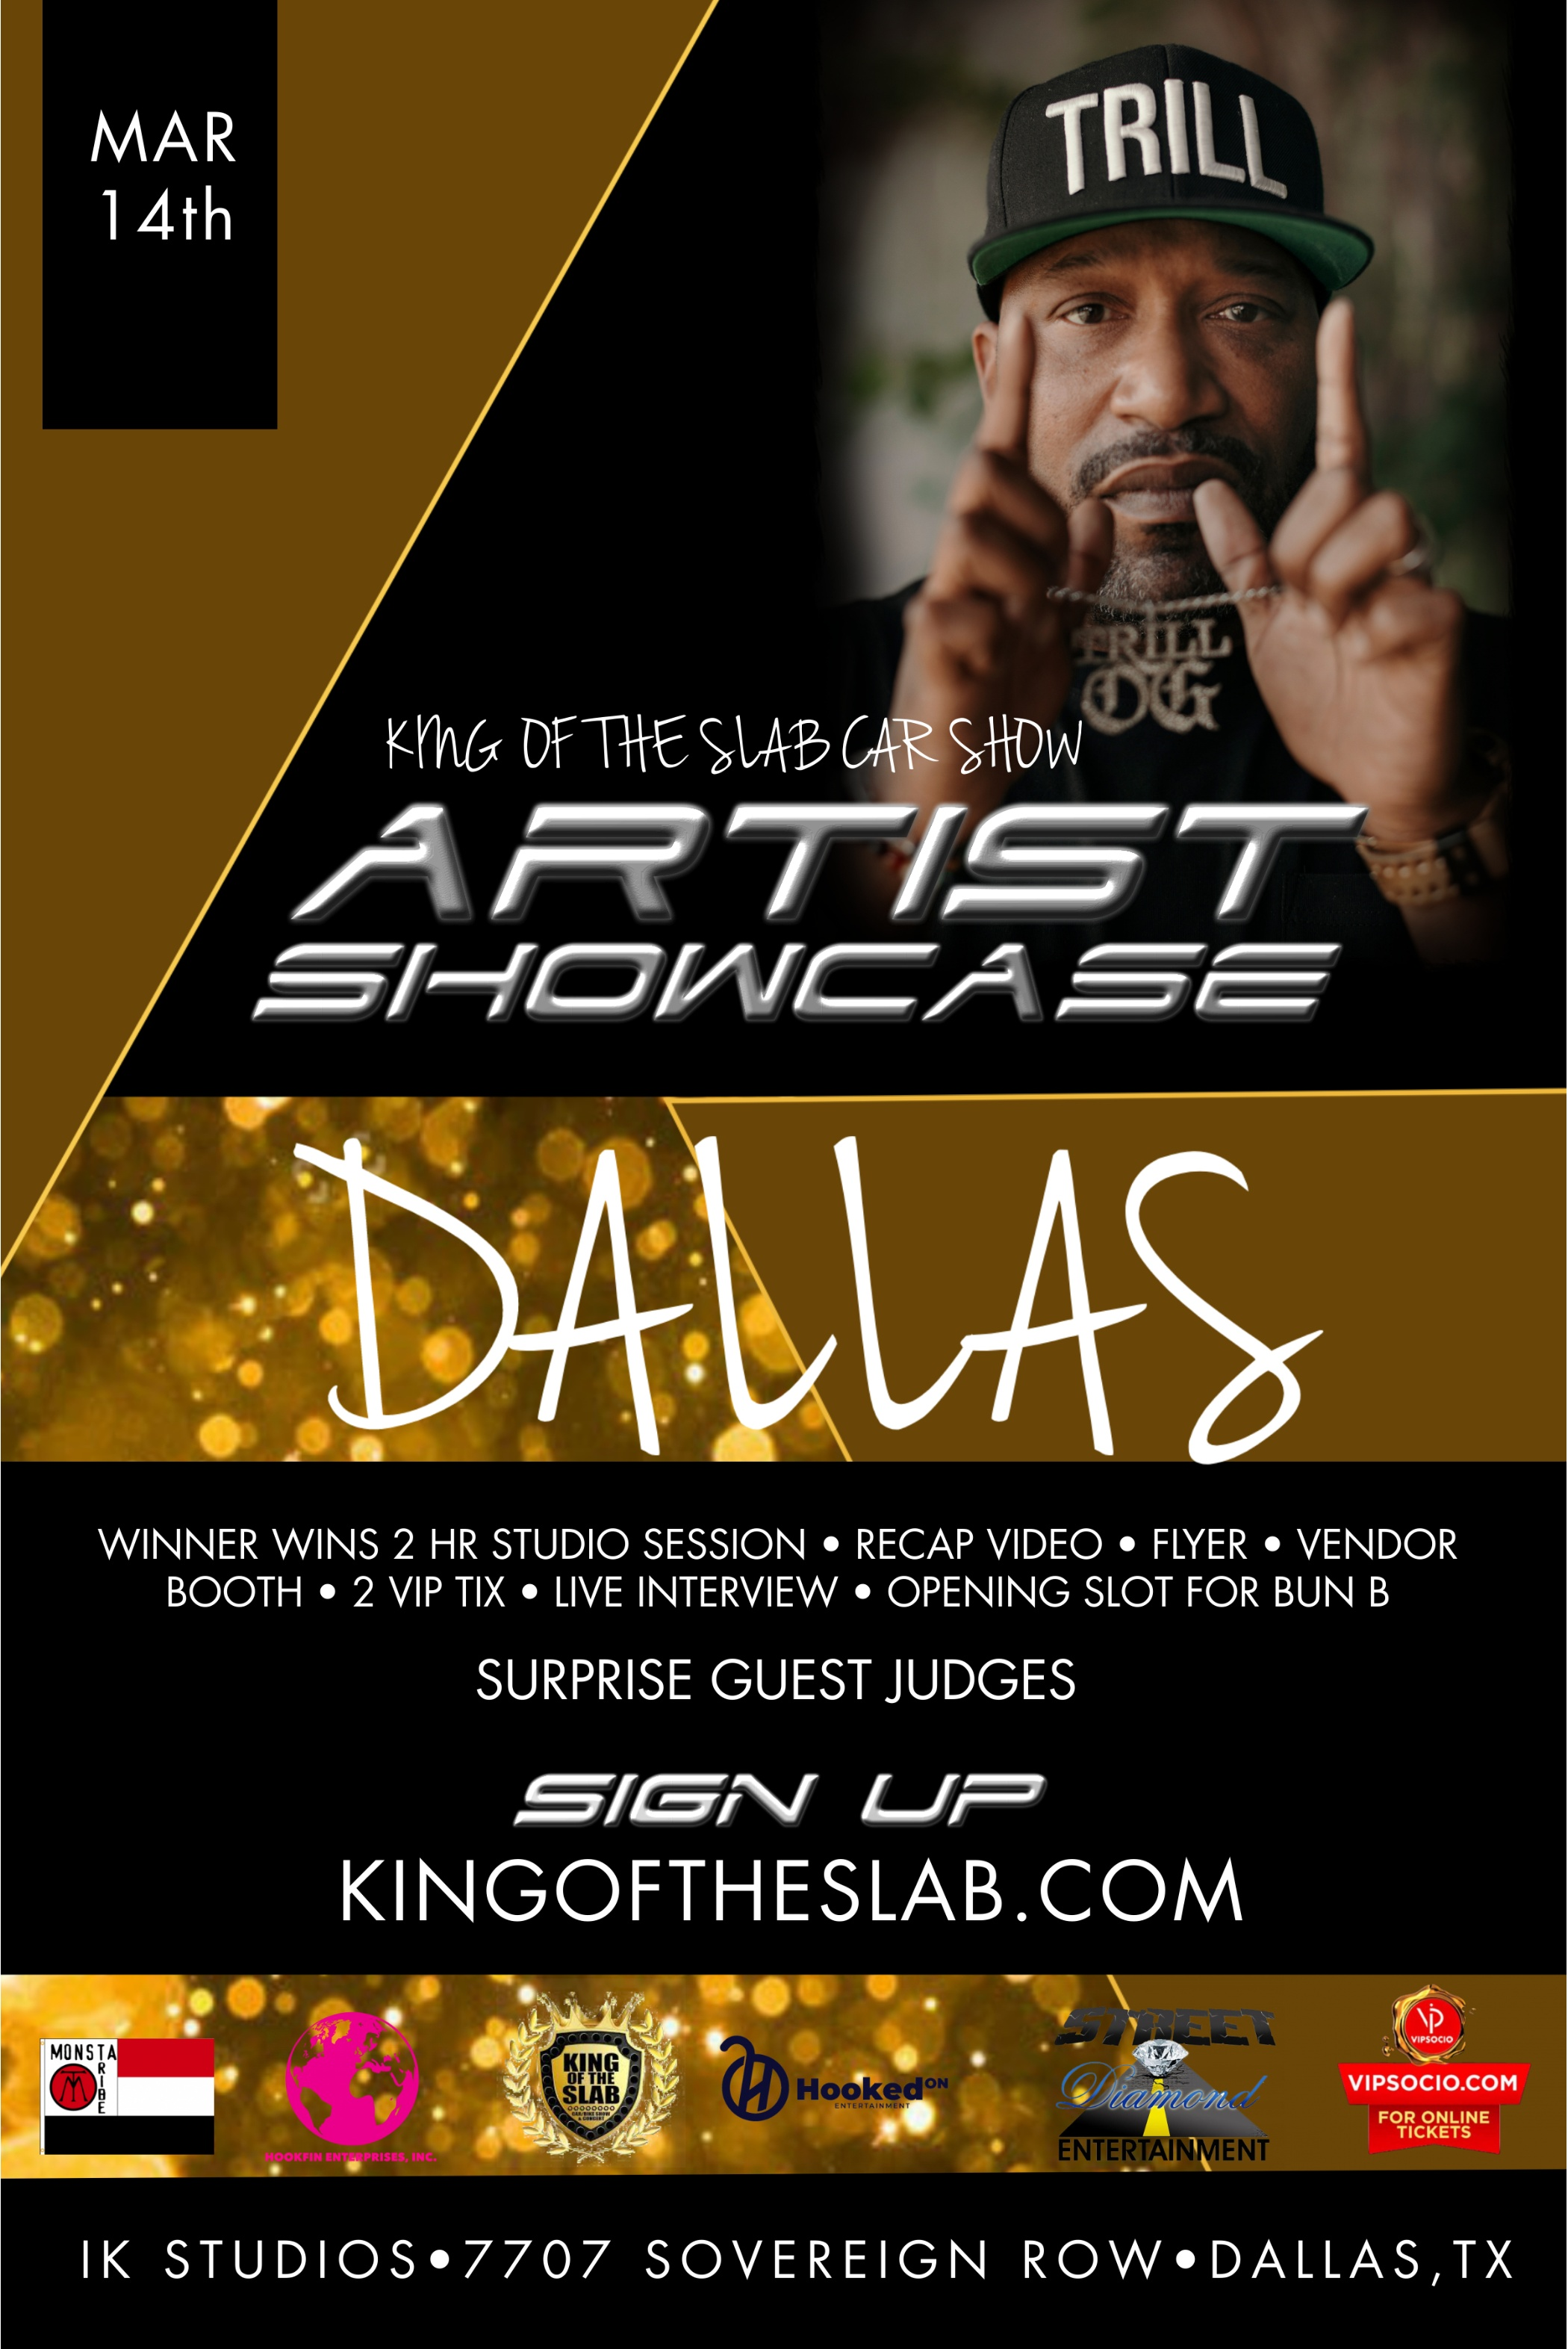 King of the Slab Dallas Artist Showcase Registration